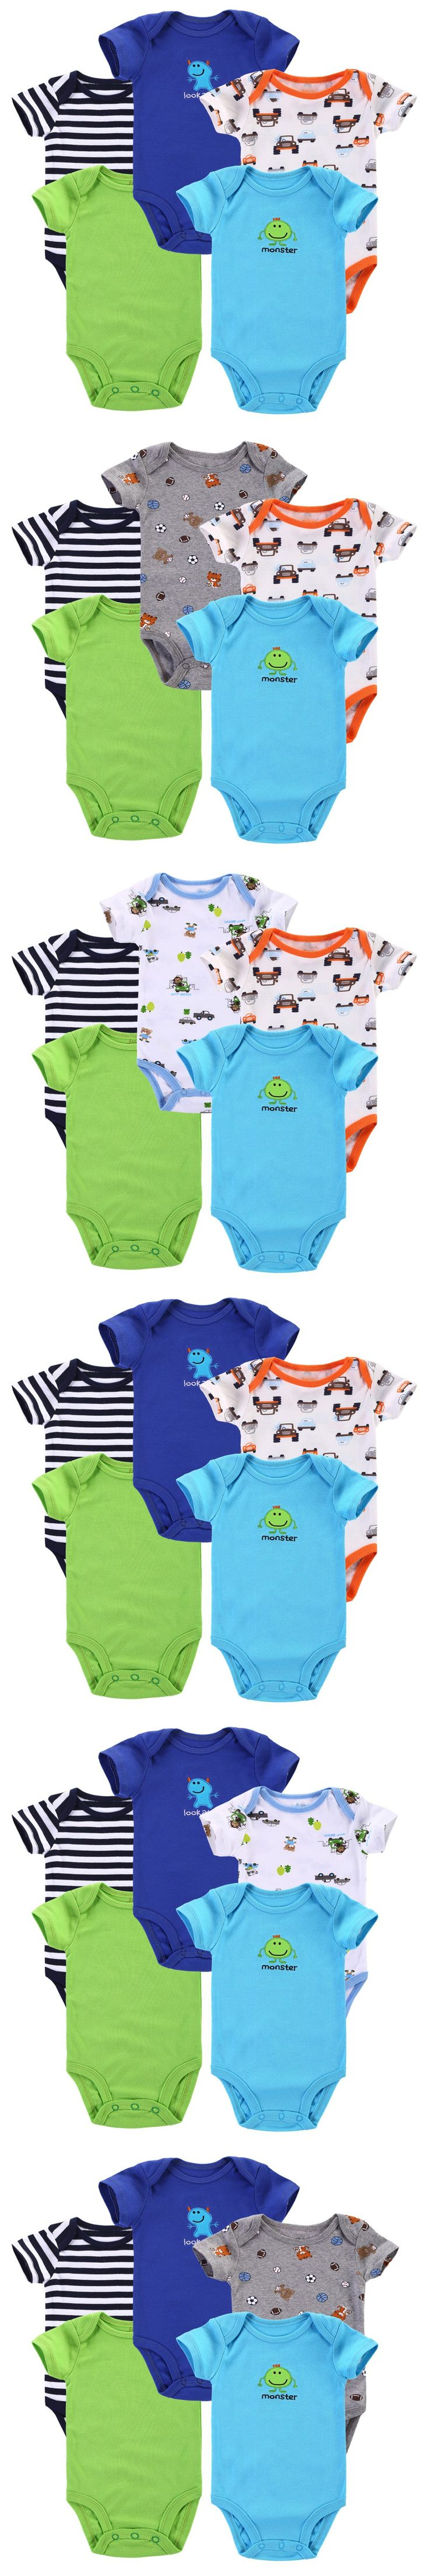 5pcs/lot 2015 Summer Baby Romper Newborn Baby Girl Boy Clothes Bebe Clothing roupas de bebe menino